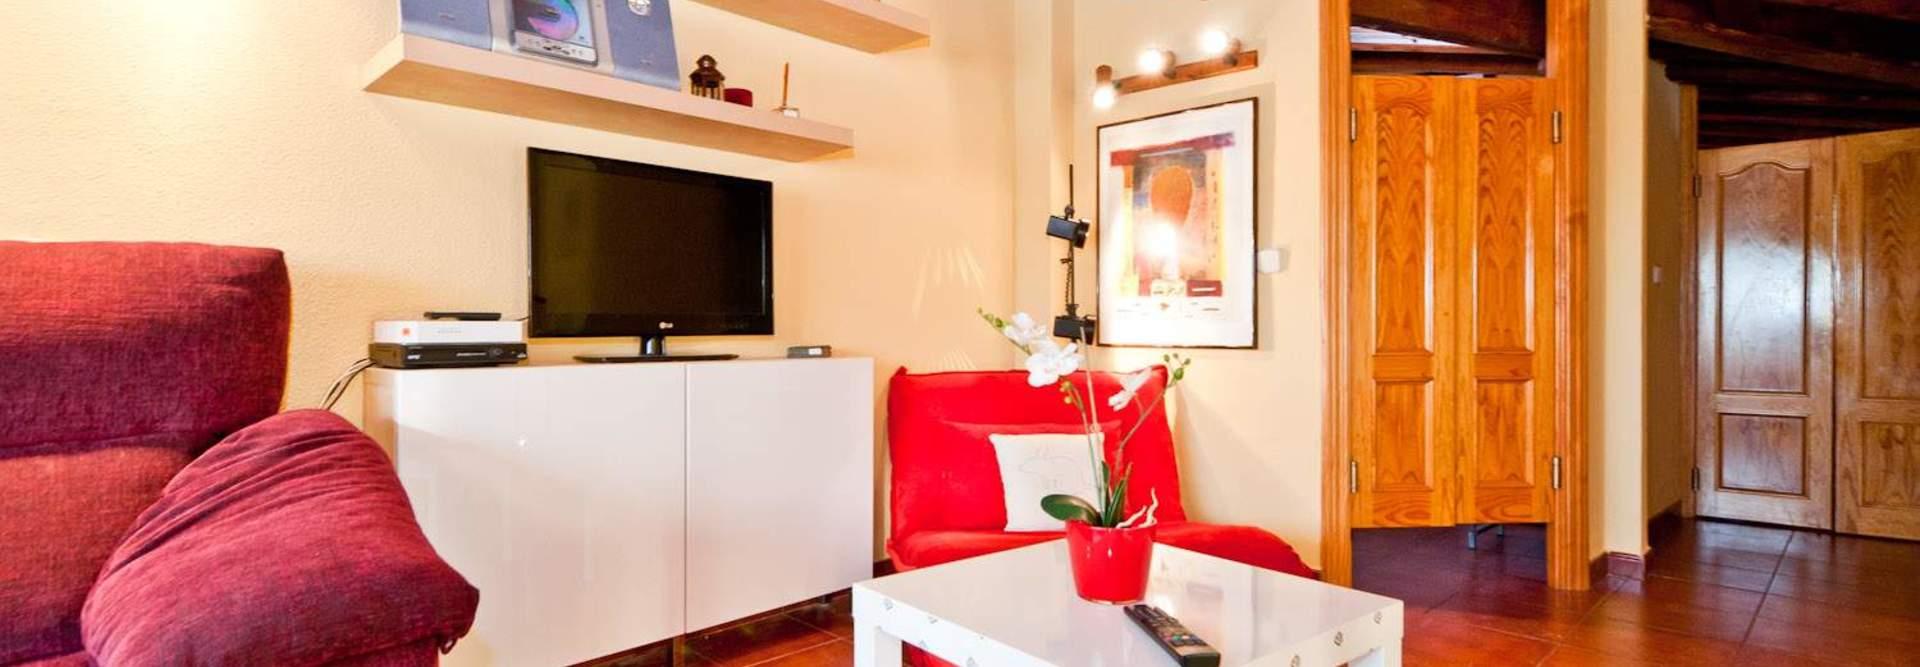 All apartments and studios at apartamentos madrid come with a kitchen area, equipped with a washing machine, hob, fridge and microwave. PRECIADOS ATICO - Alquiler de apartamento en centro Madrid